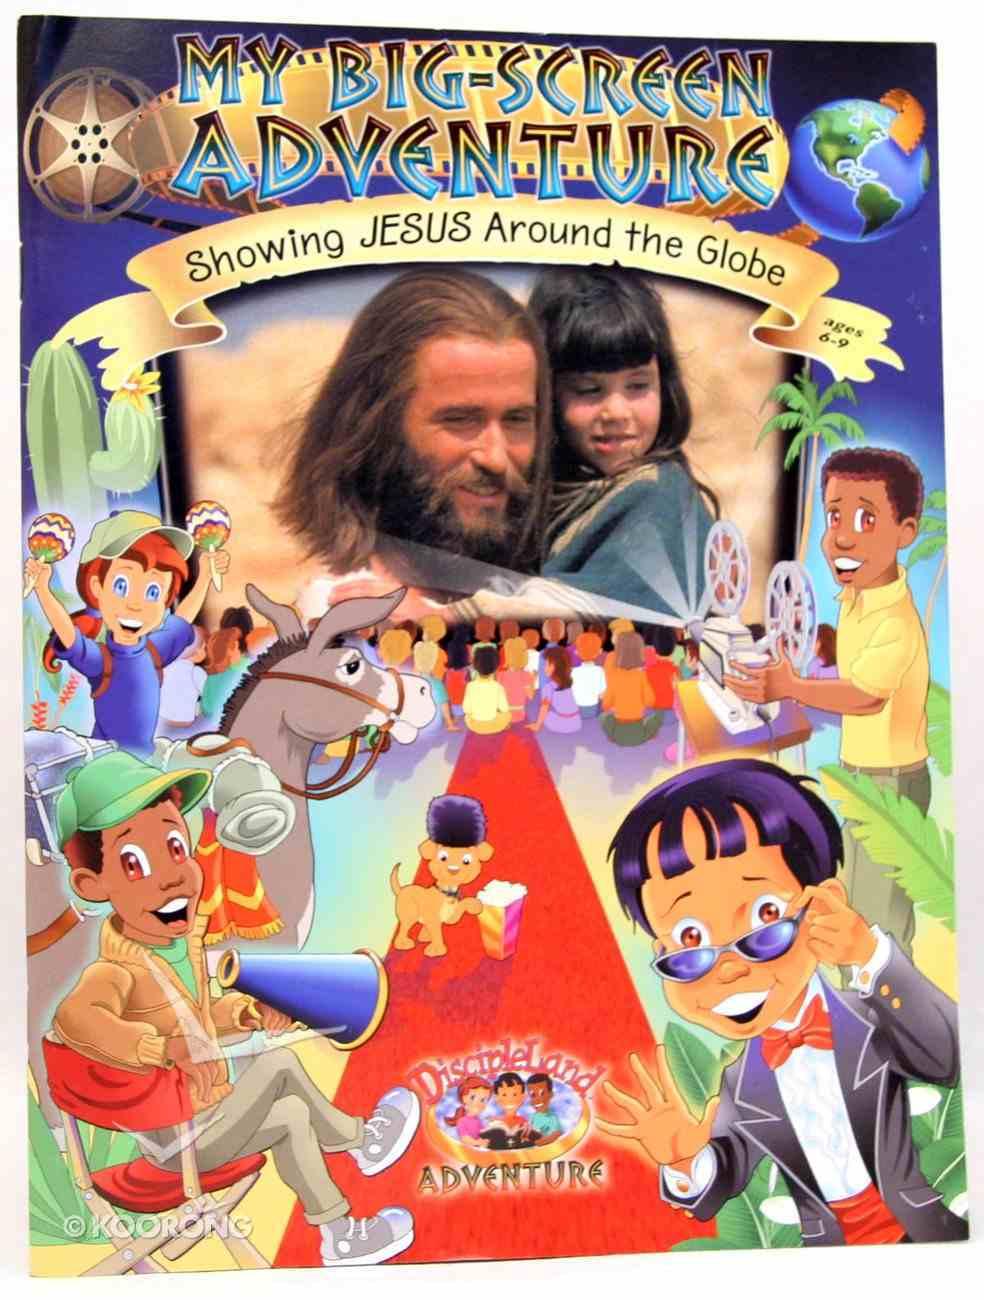 Dlc My Big-Screen Adventure Ages 6-9 (Student) (Discipleland Curriculum Series) Paperback